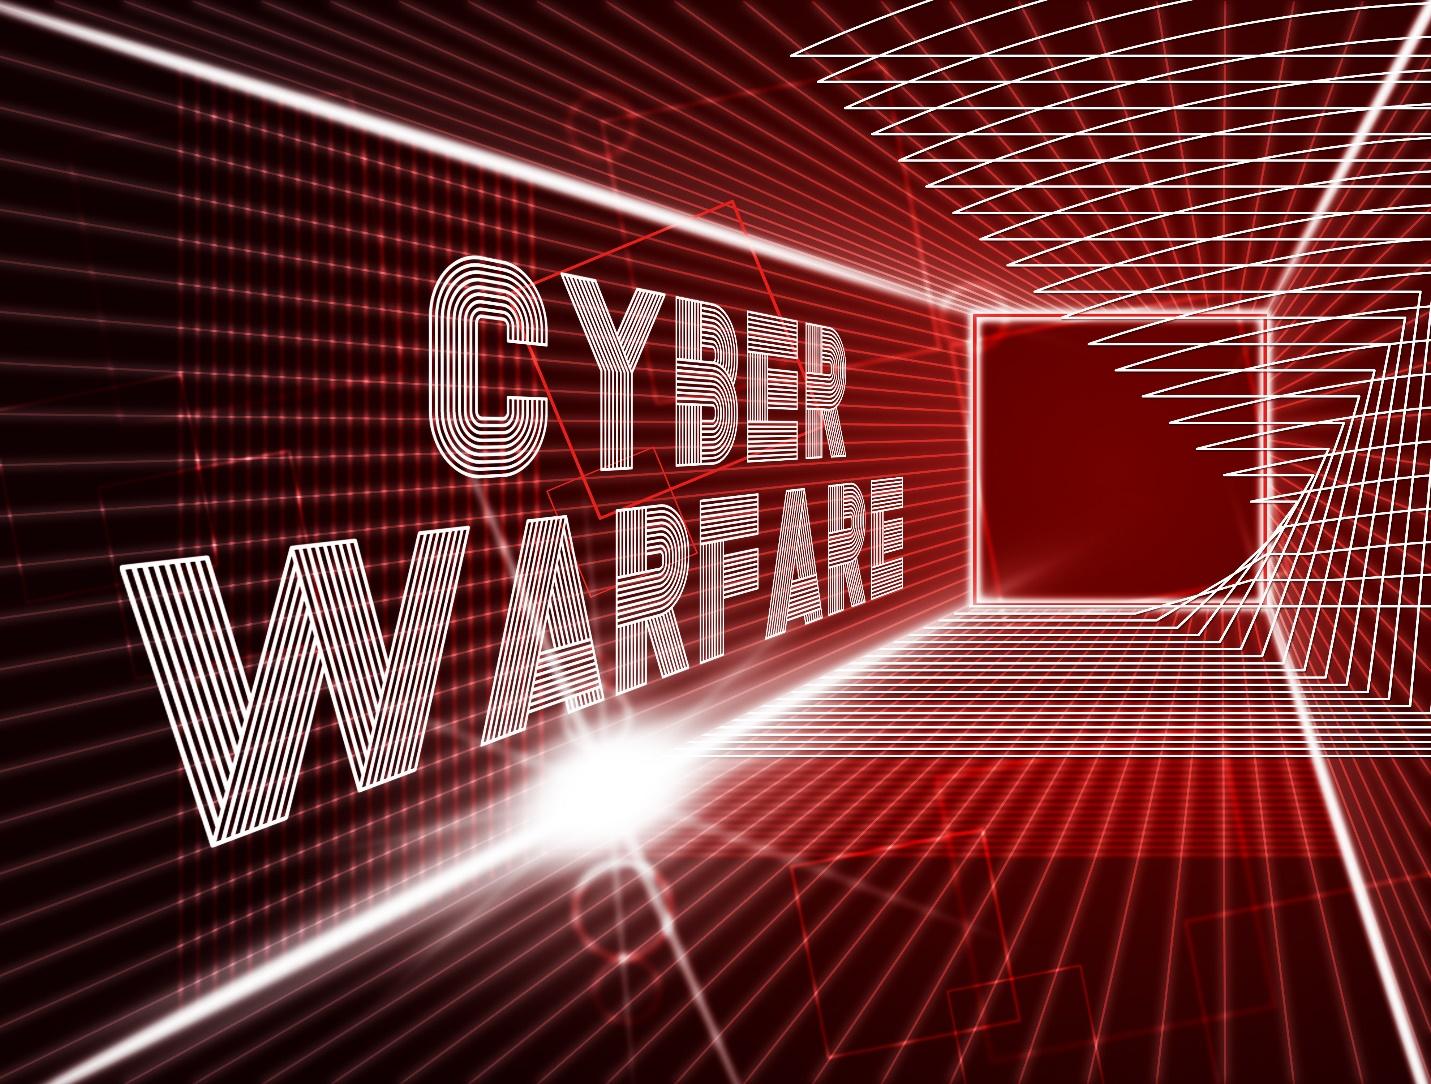 Cyberwarfare Digital Armed Attack Surveillance